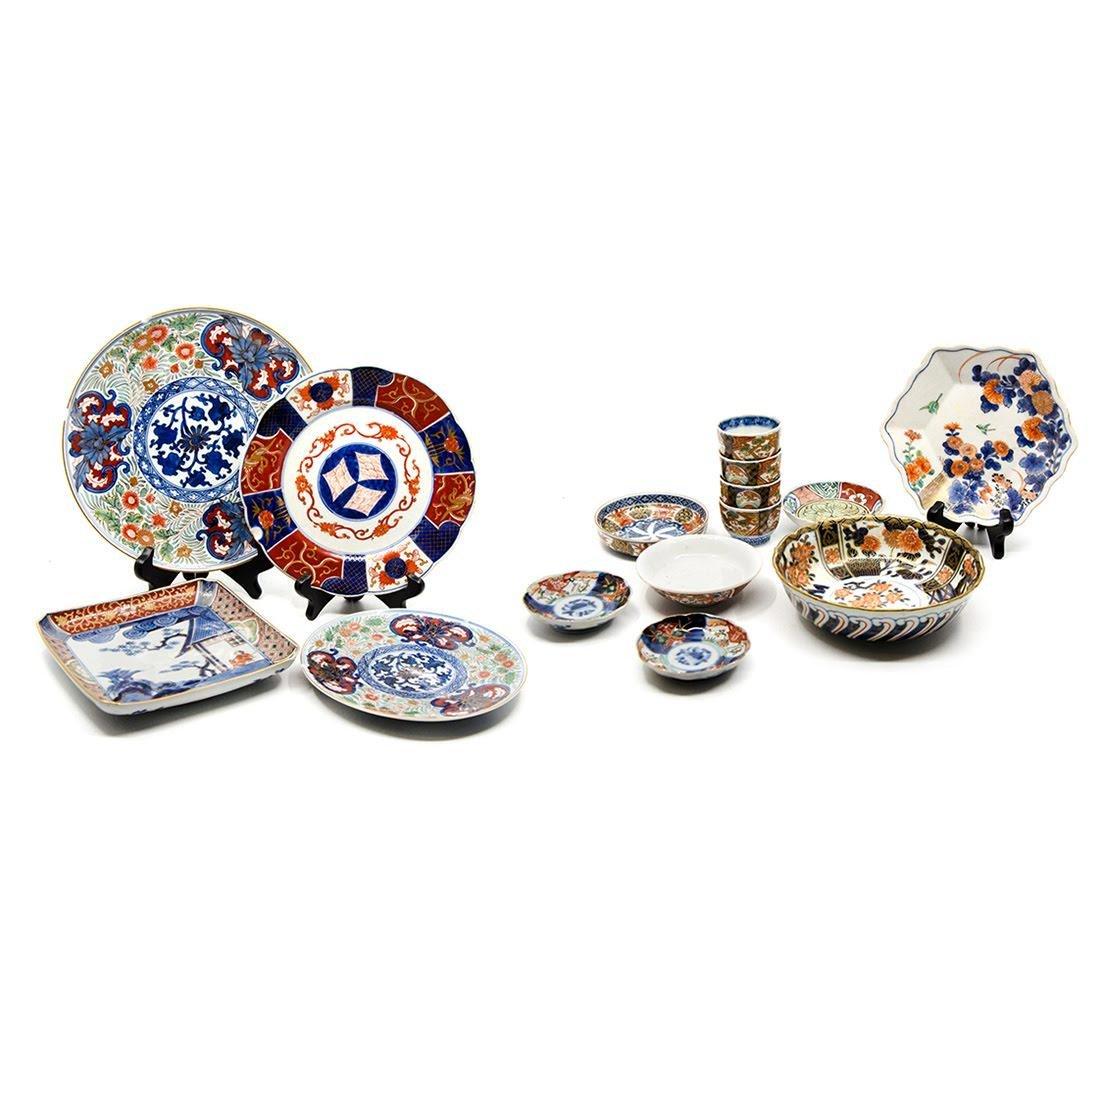 Collection of Antique Imari Porcelain